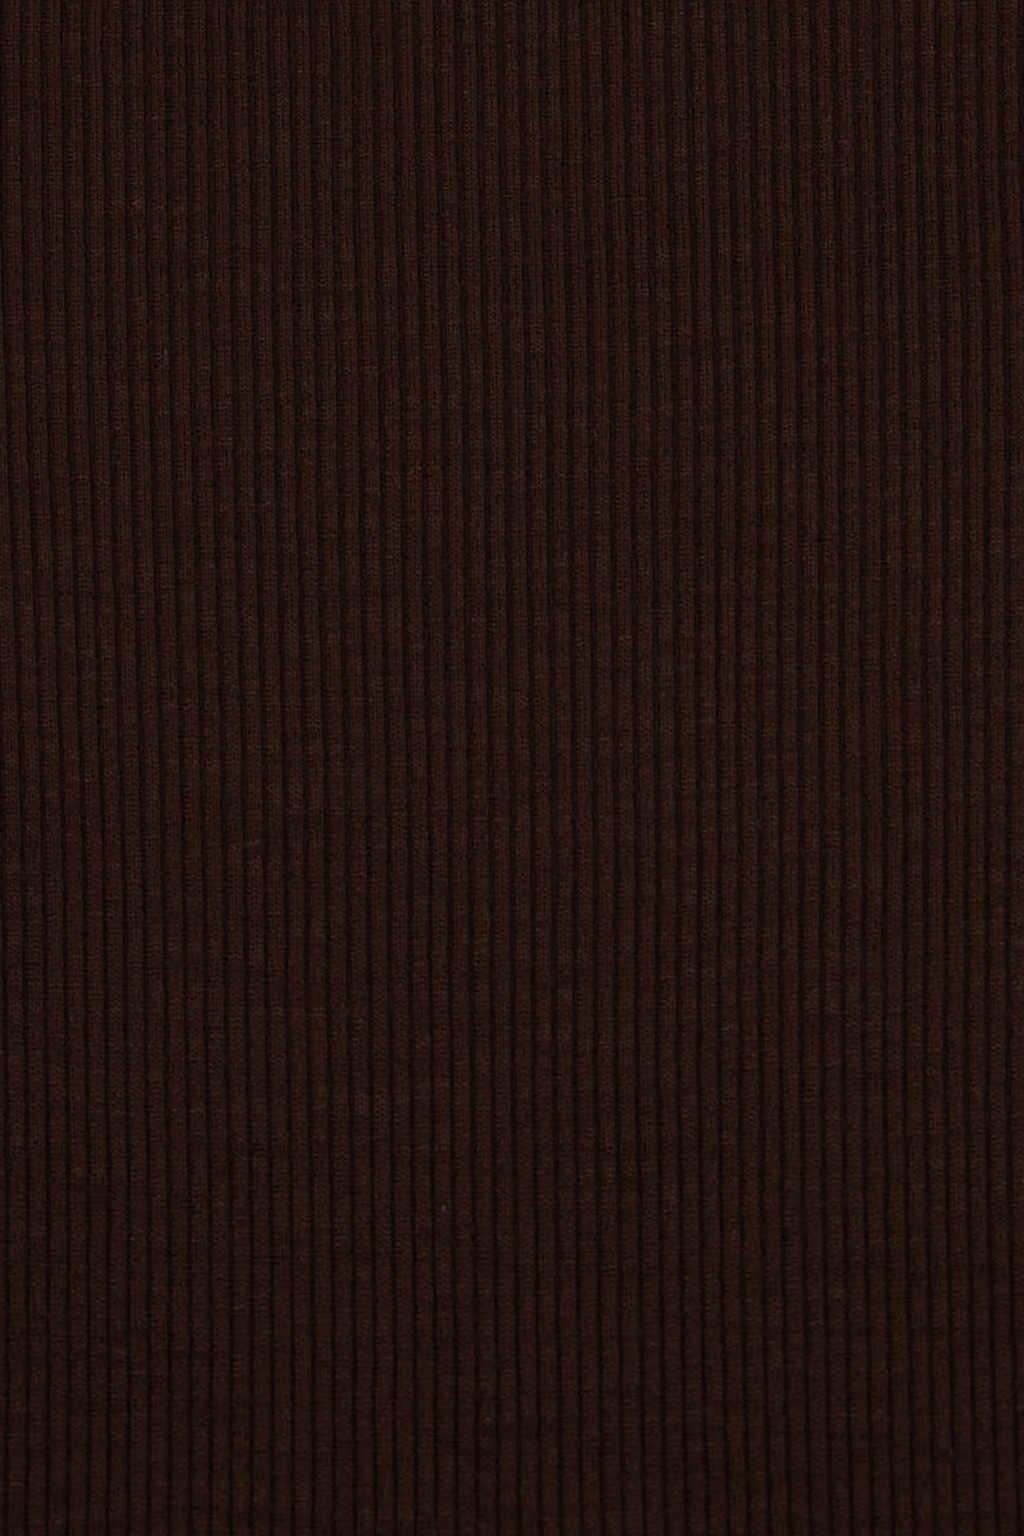 TShirt H539 Brown 10